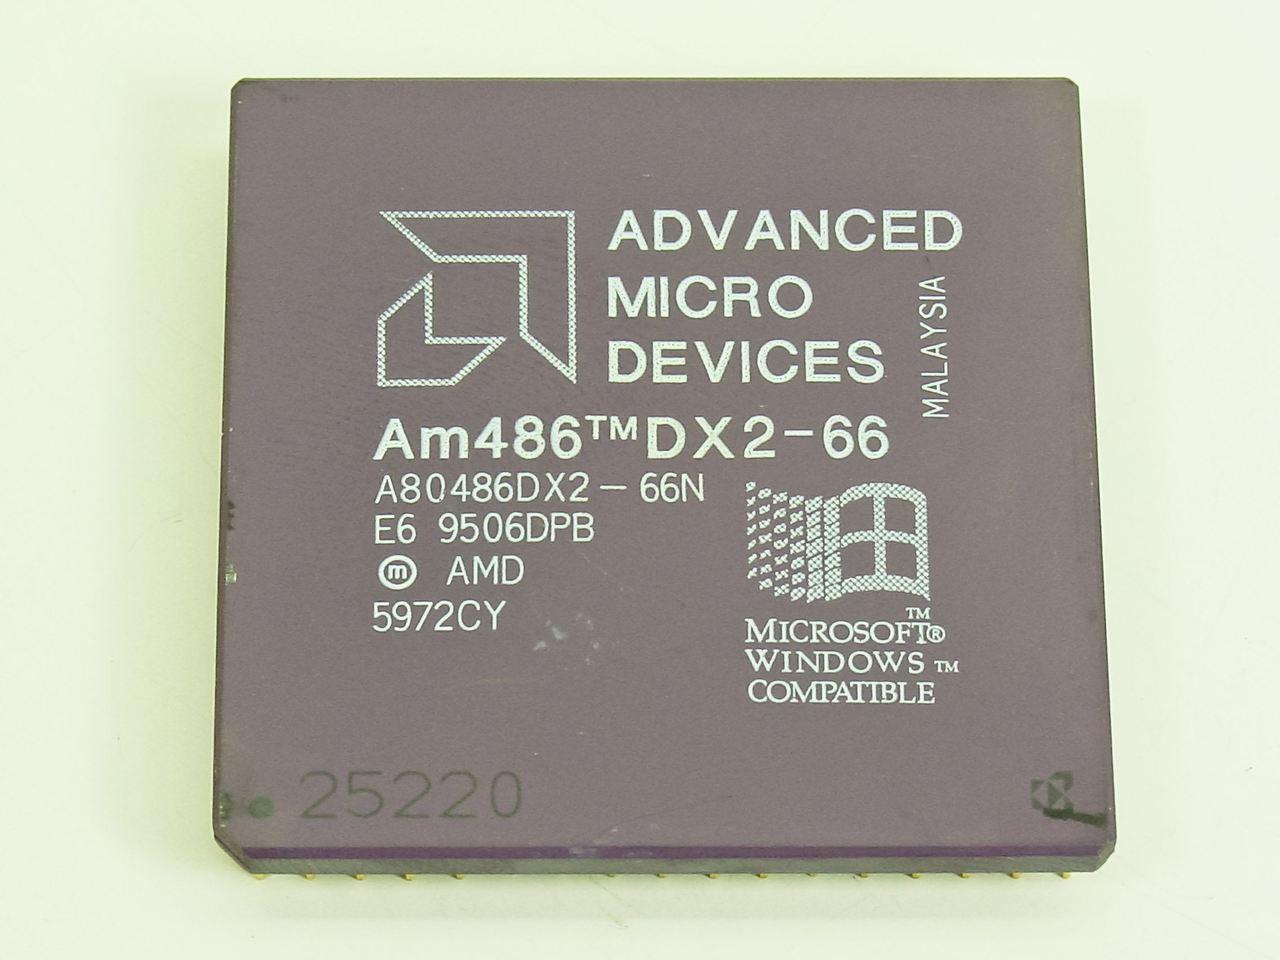 AMD A80486DX2-66N 66MHZ CPU AMD A80486DX2-66N